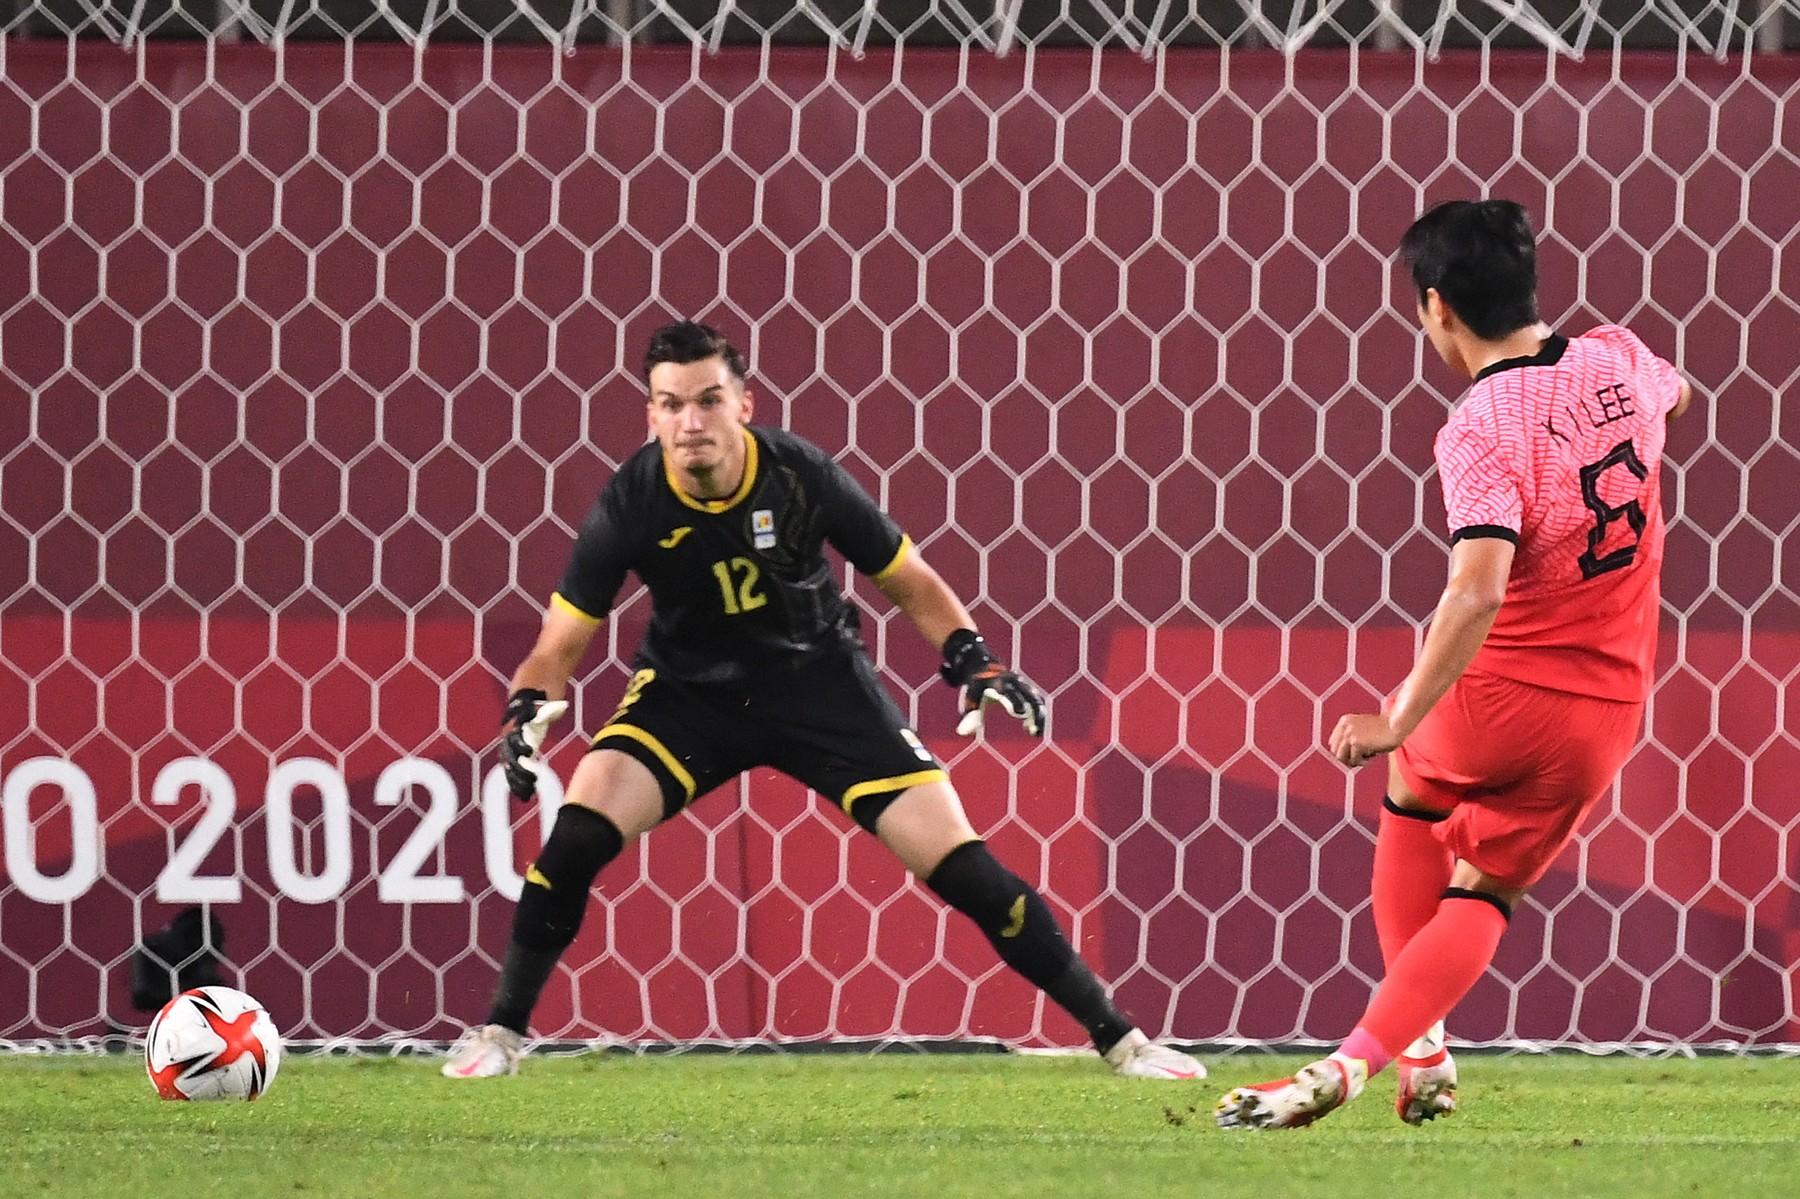 România U23/Sursa foto: Profimedia Images